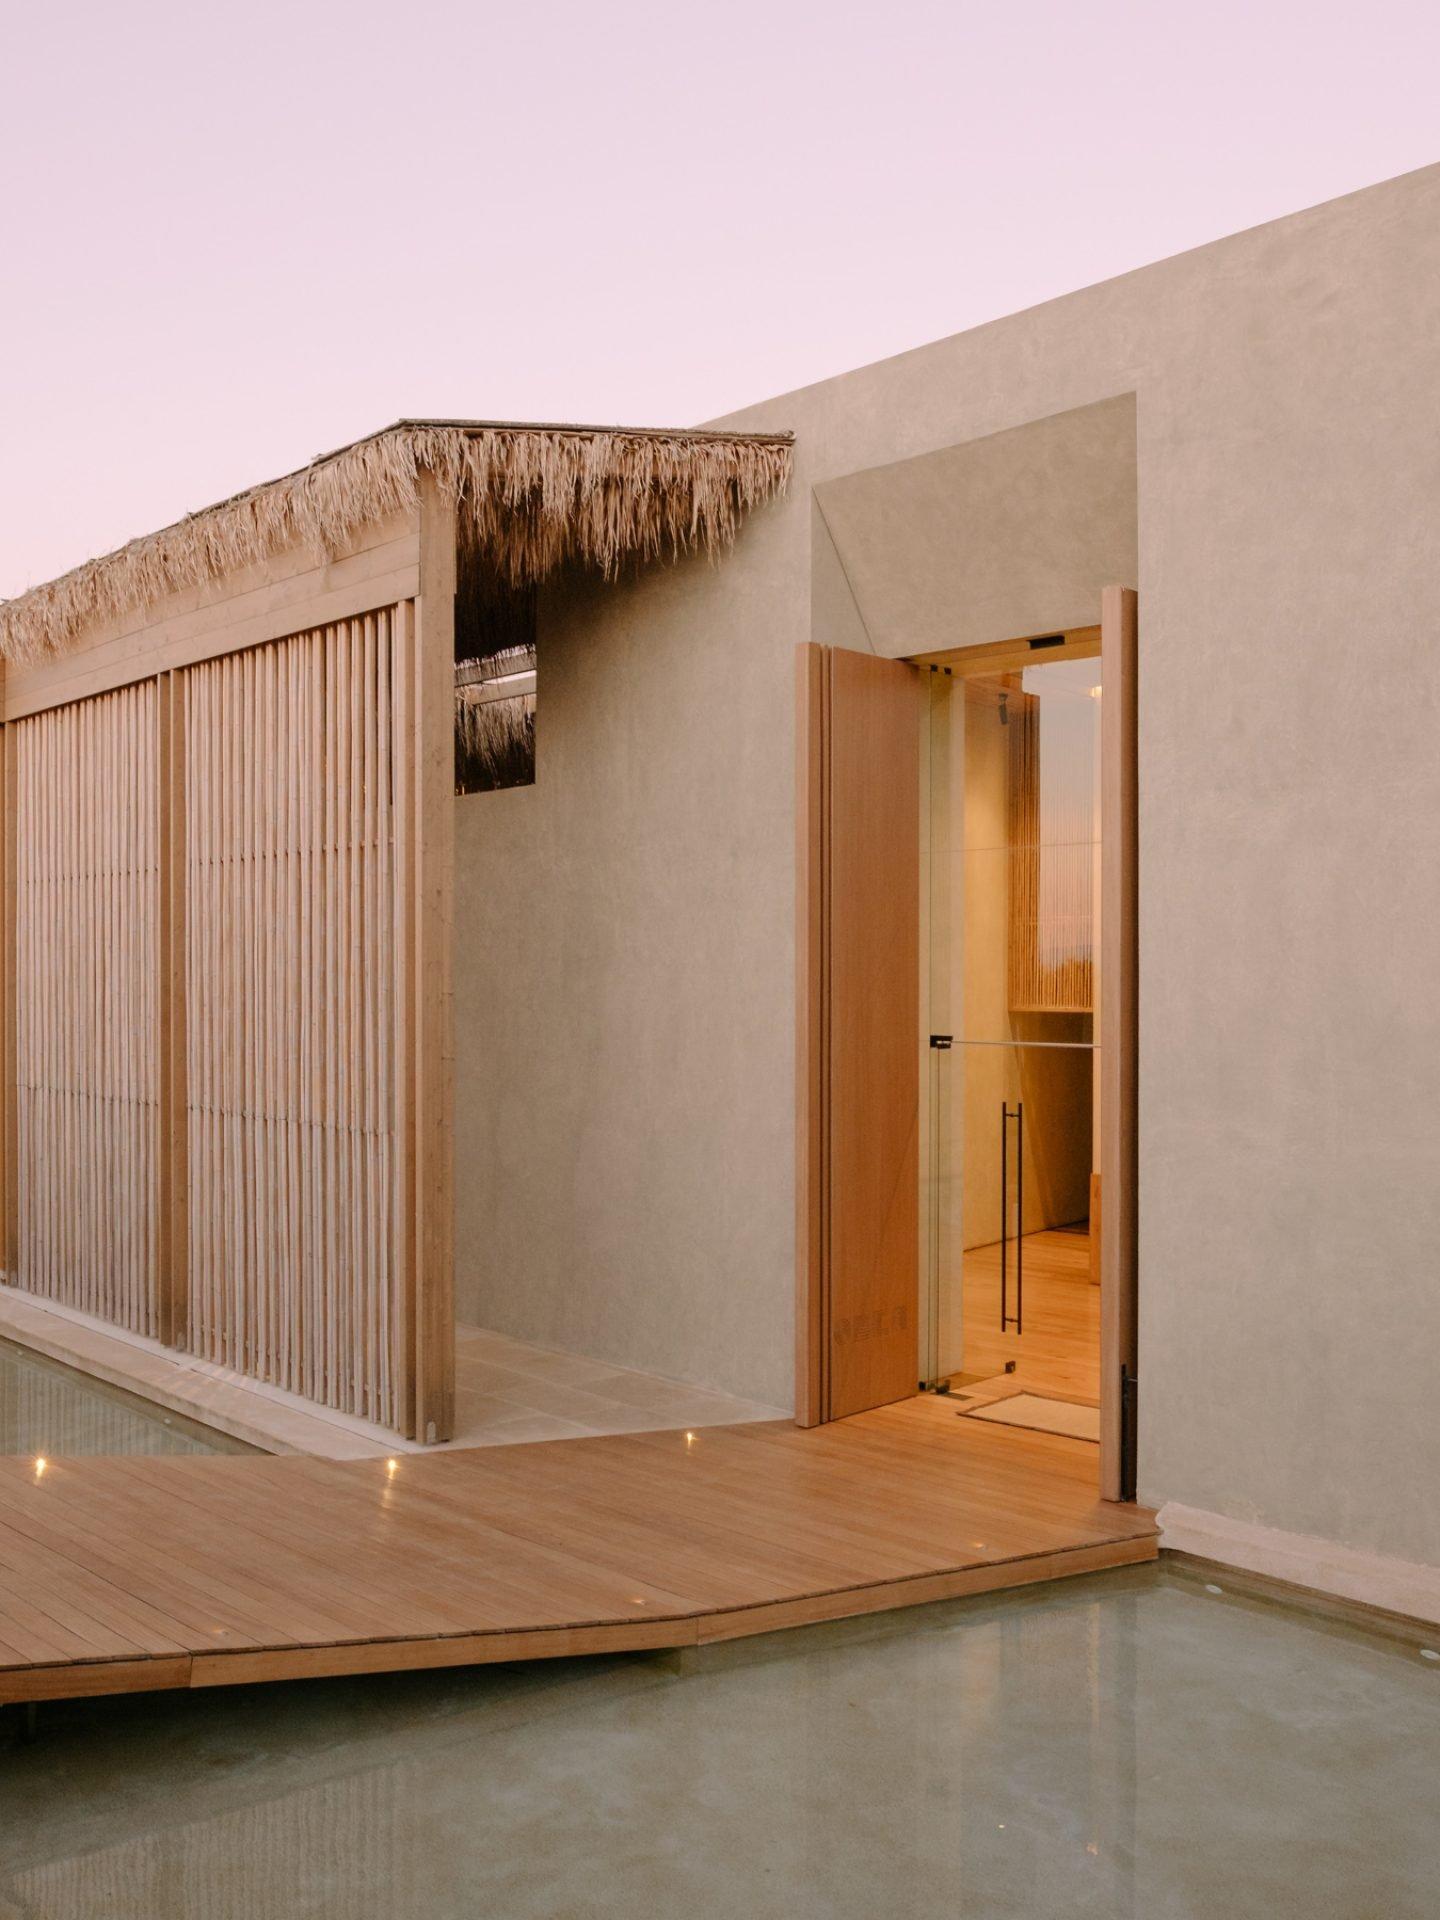 IGNANT-Travel-Olea-All-Suite-hotel-Greece-08